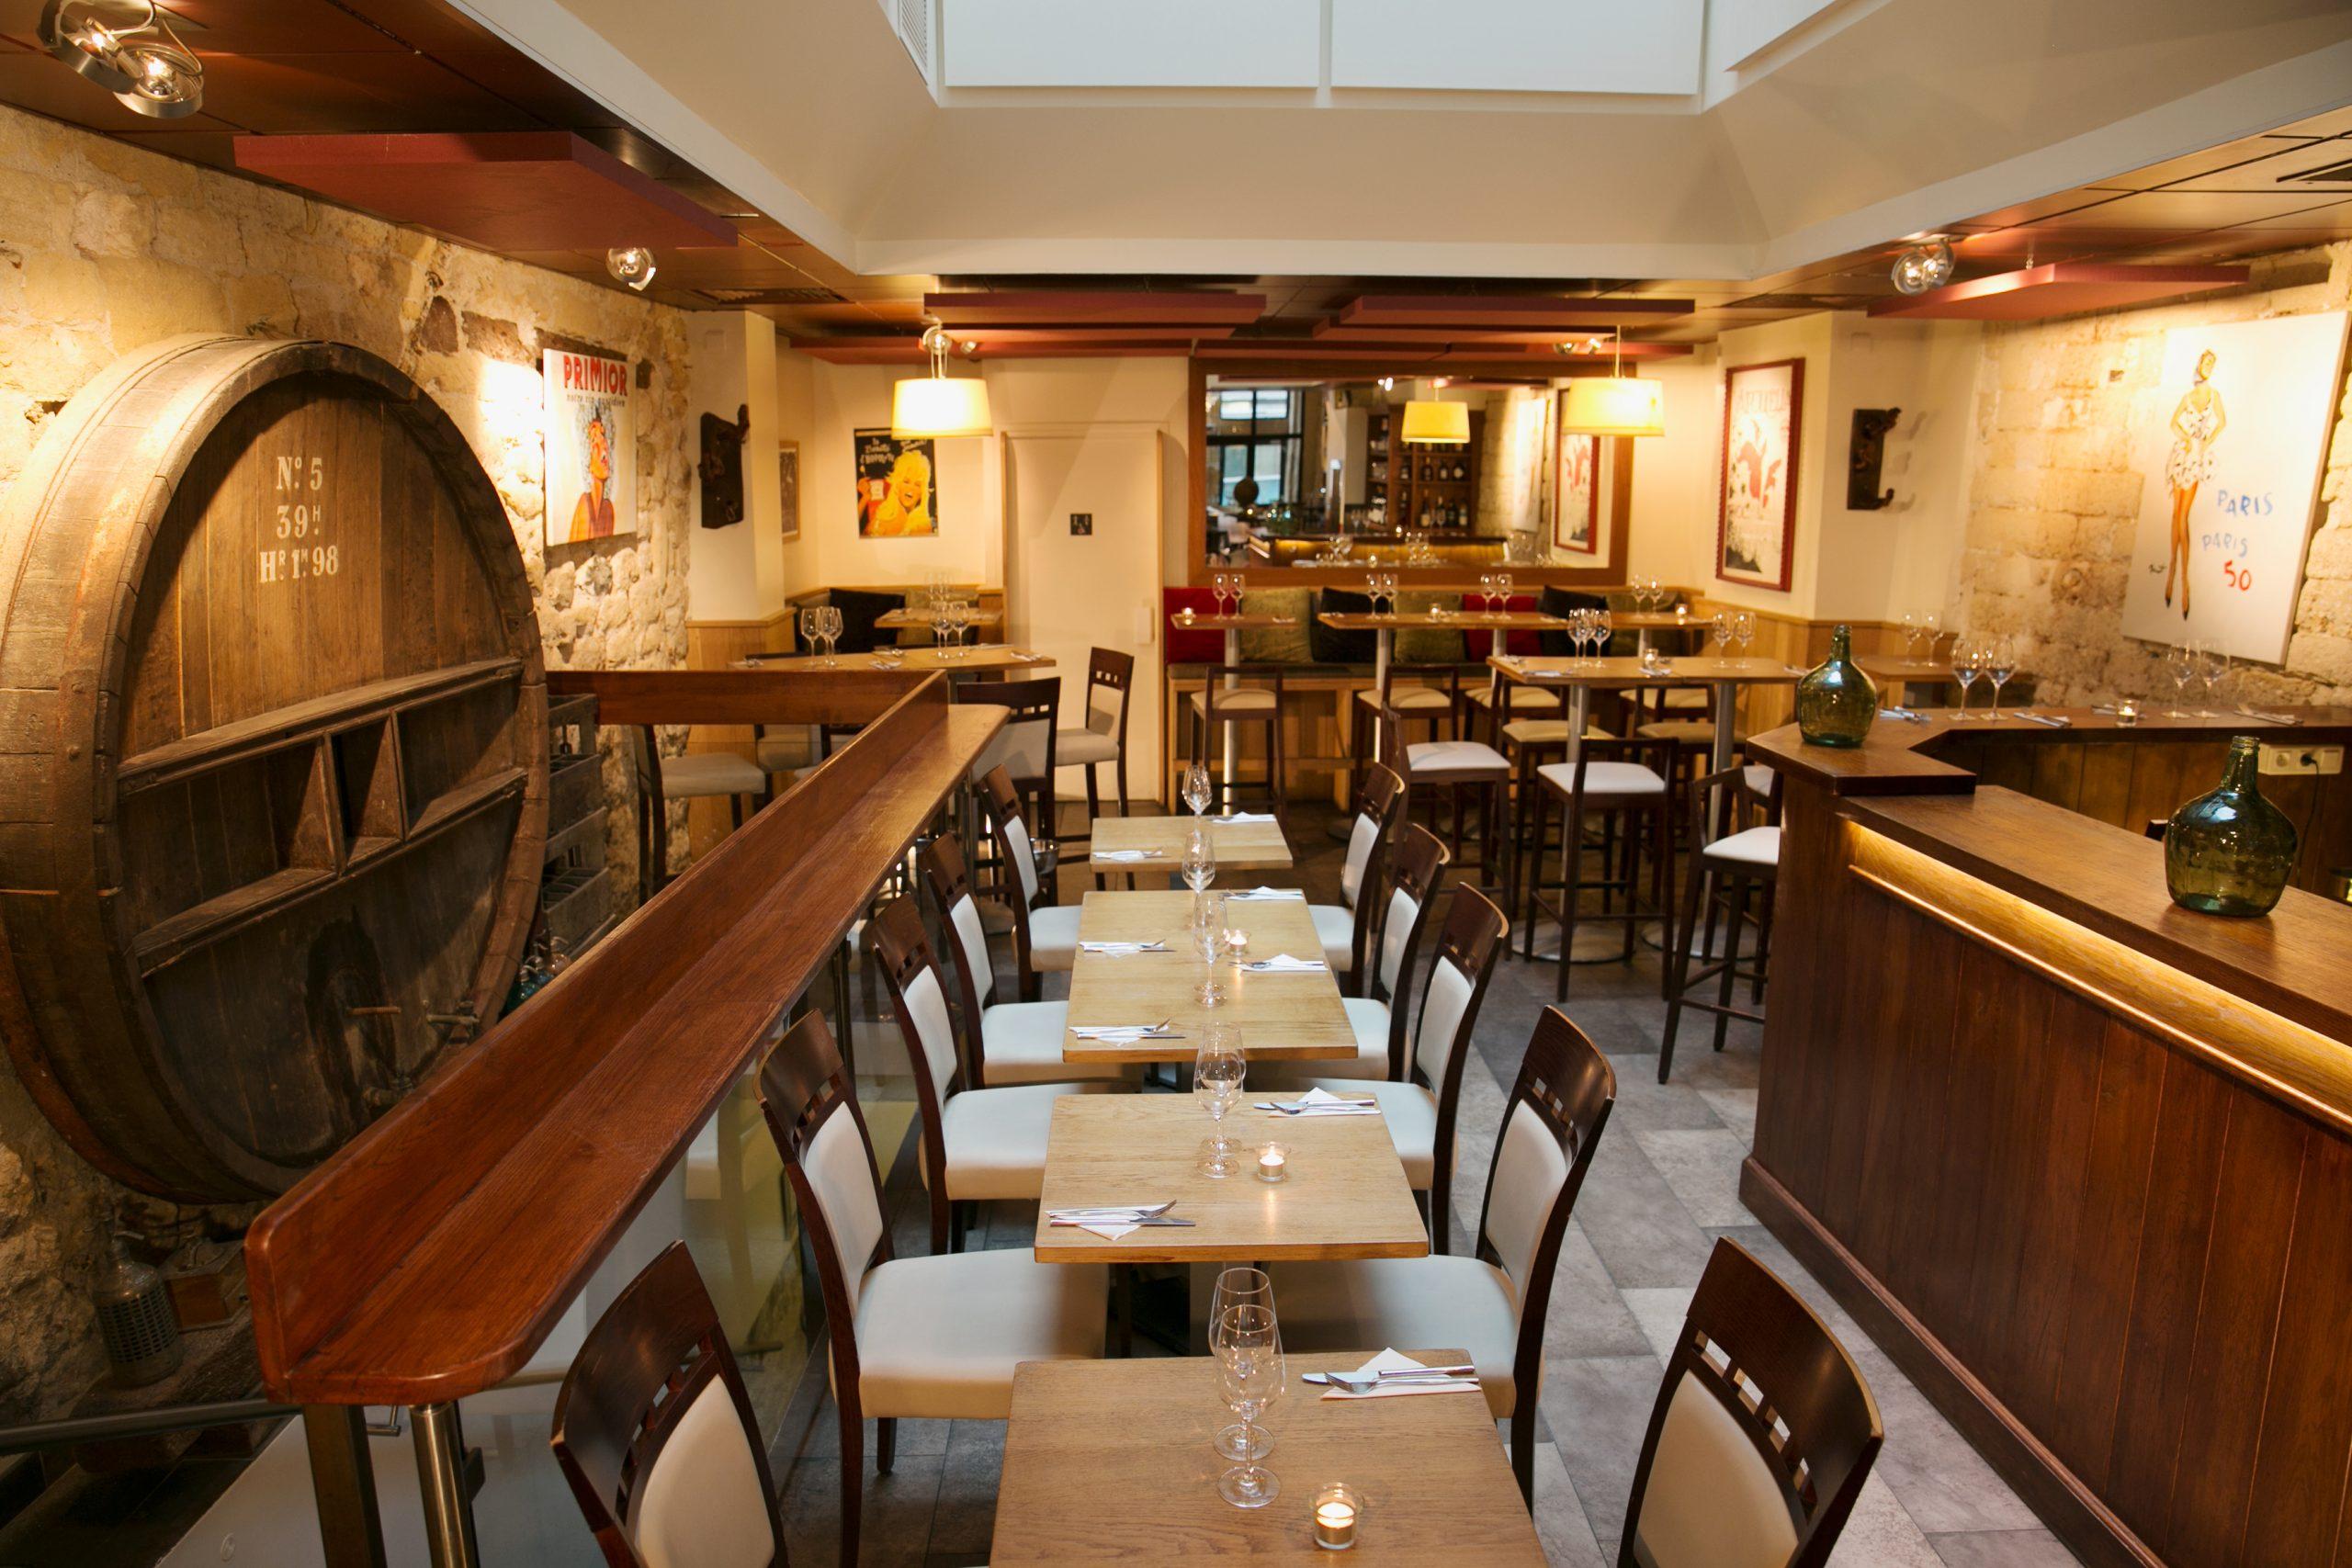 Salle Restaurant de l'Art Source